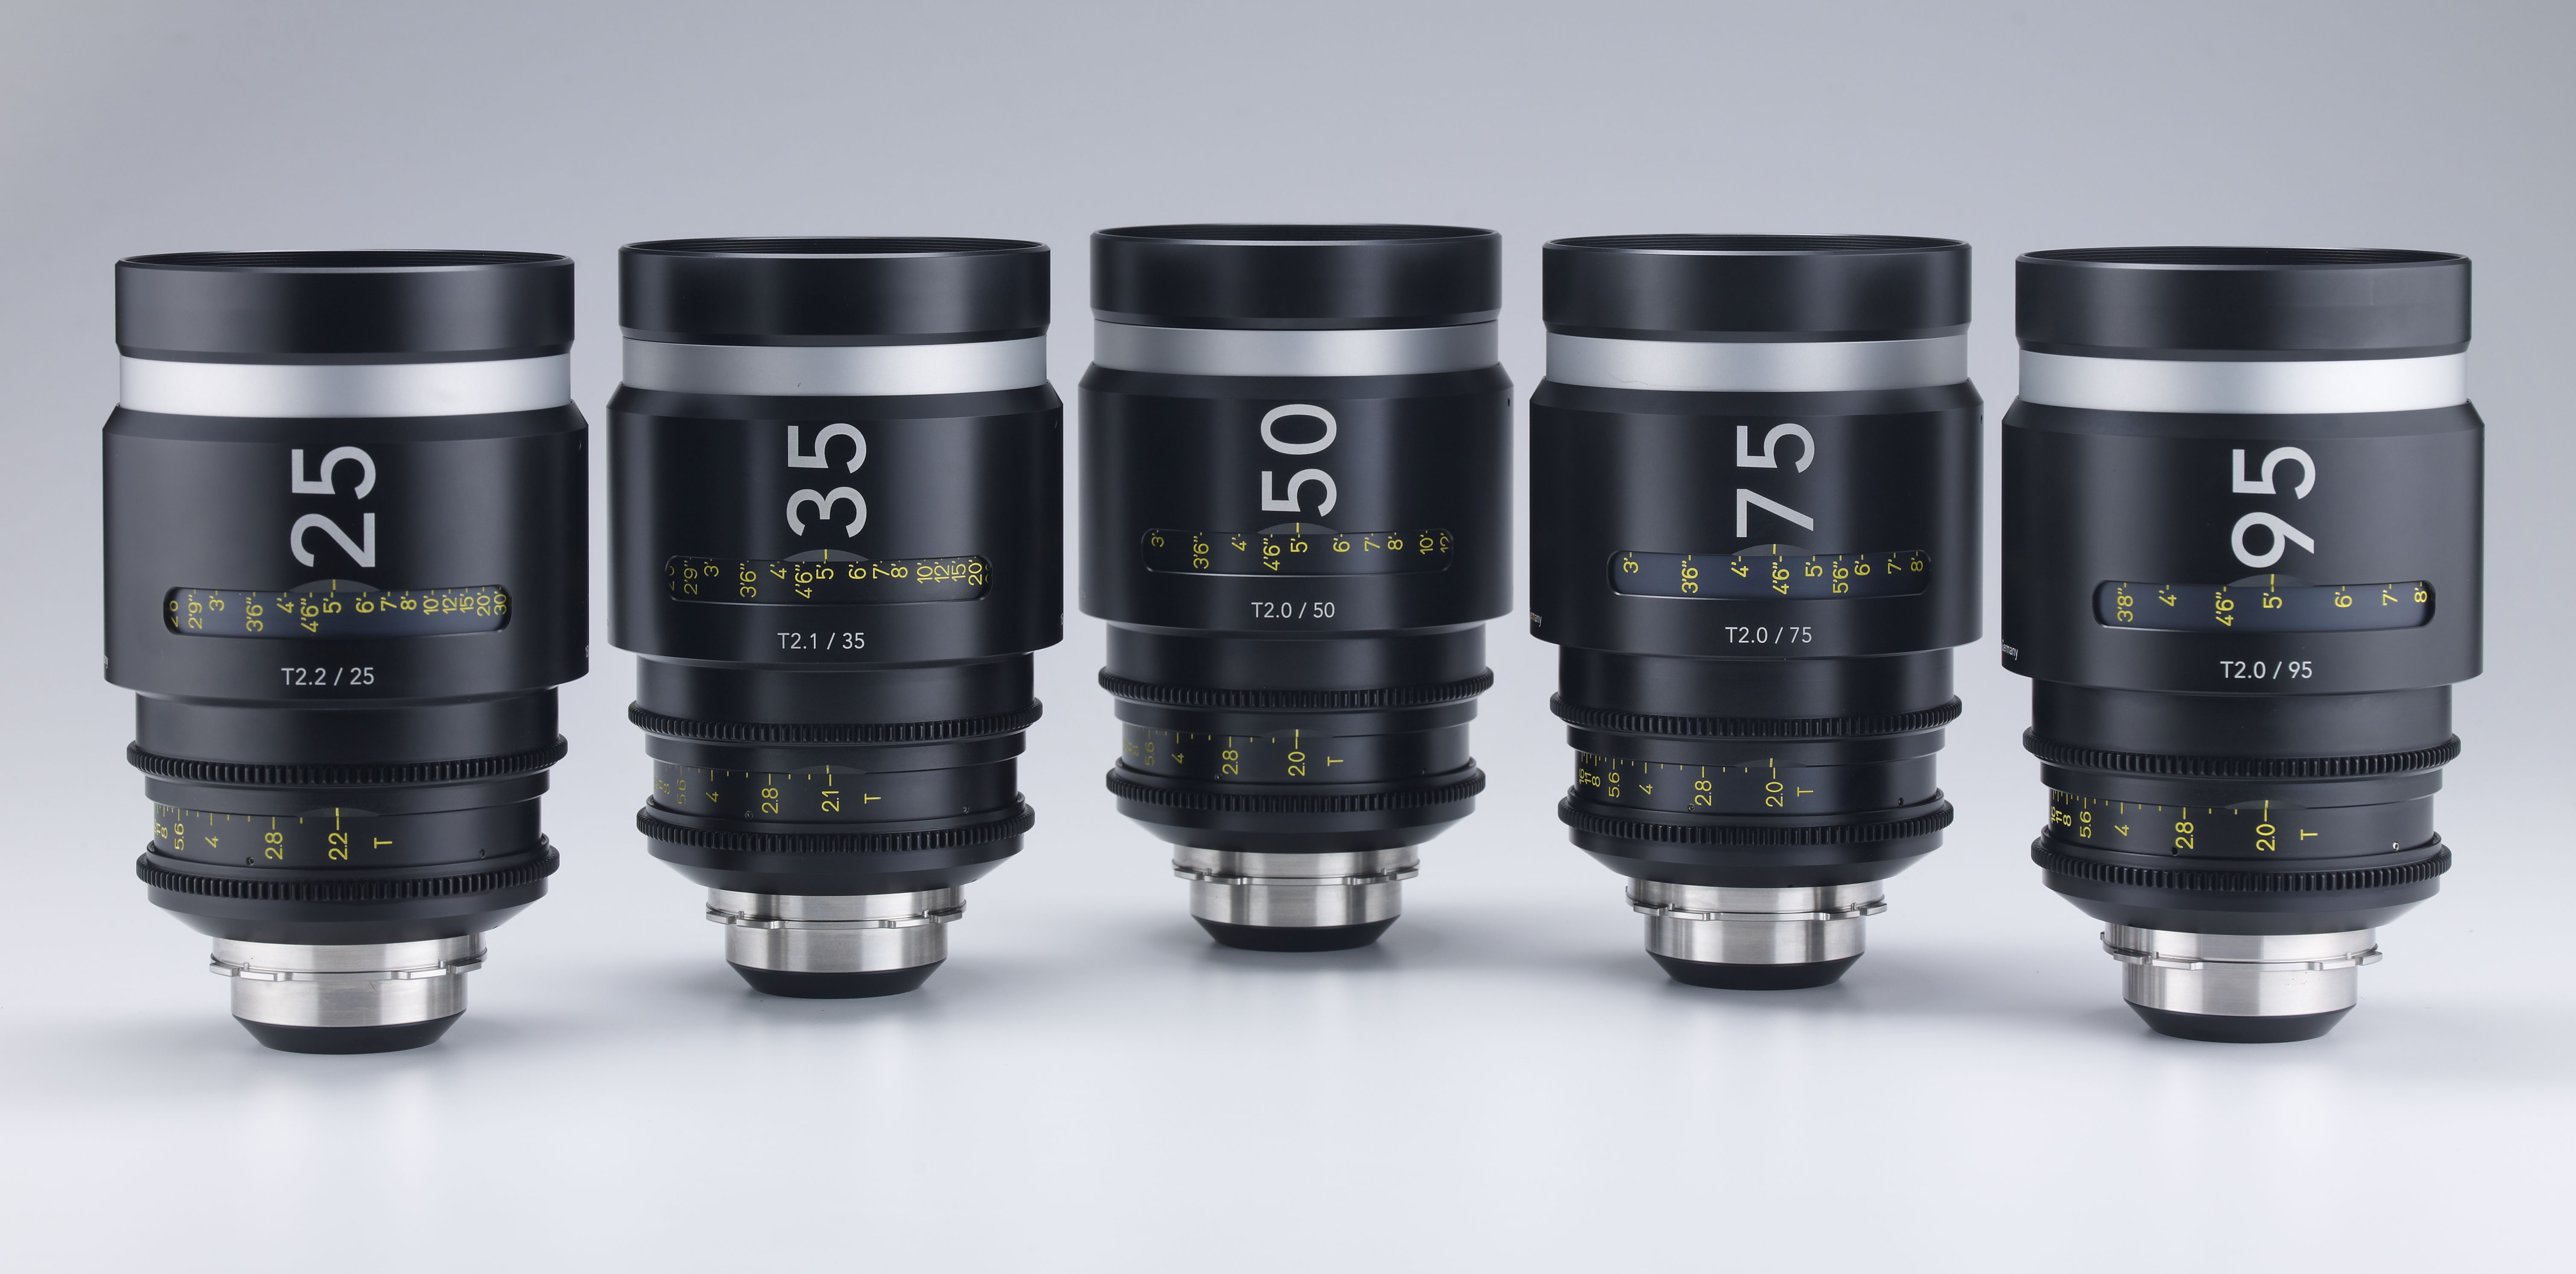 schneider-cine-xenar-iii-primes-lenses-3